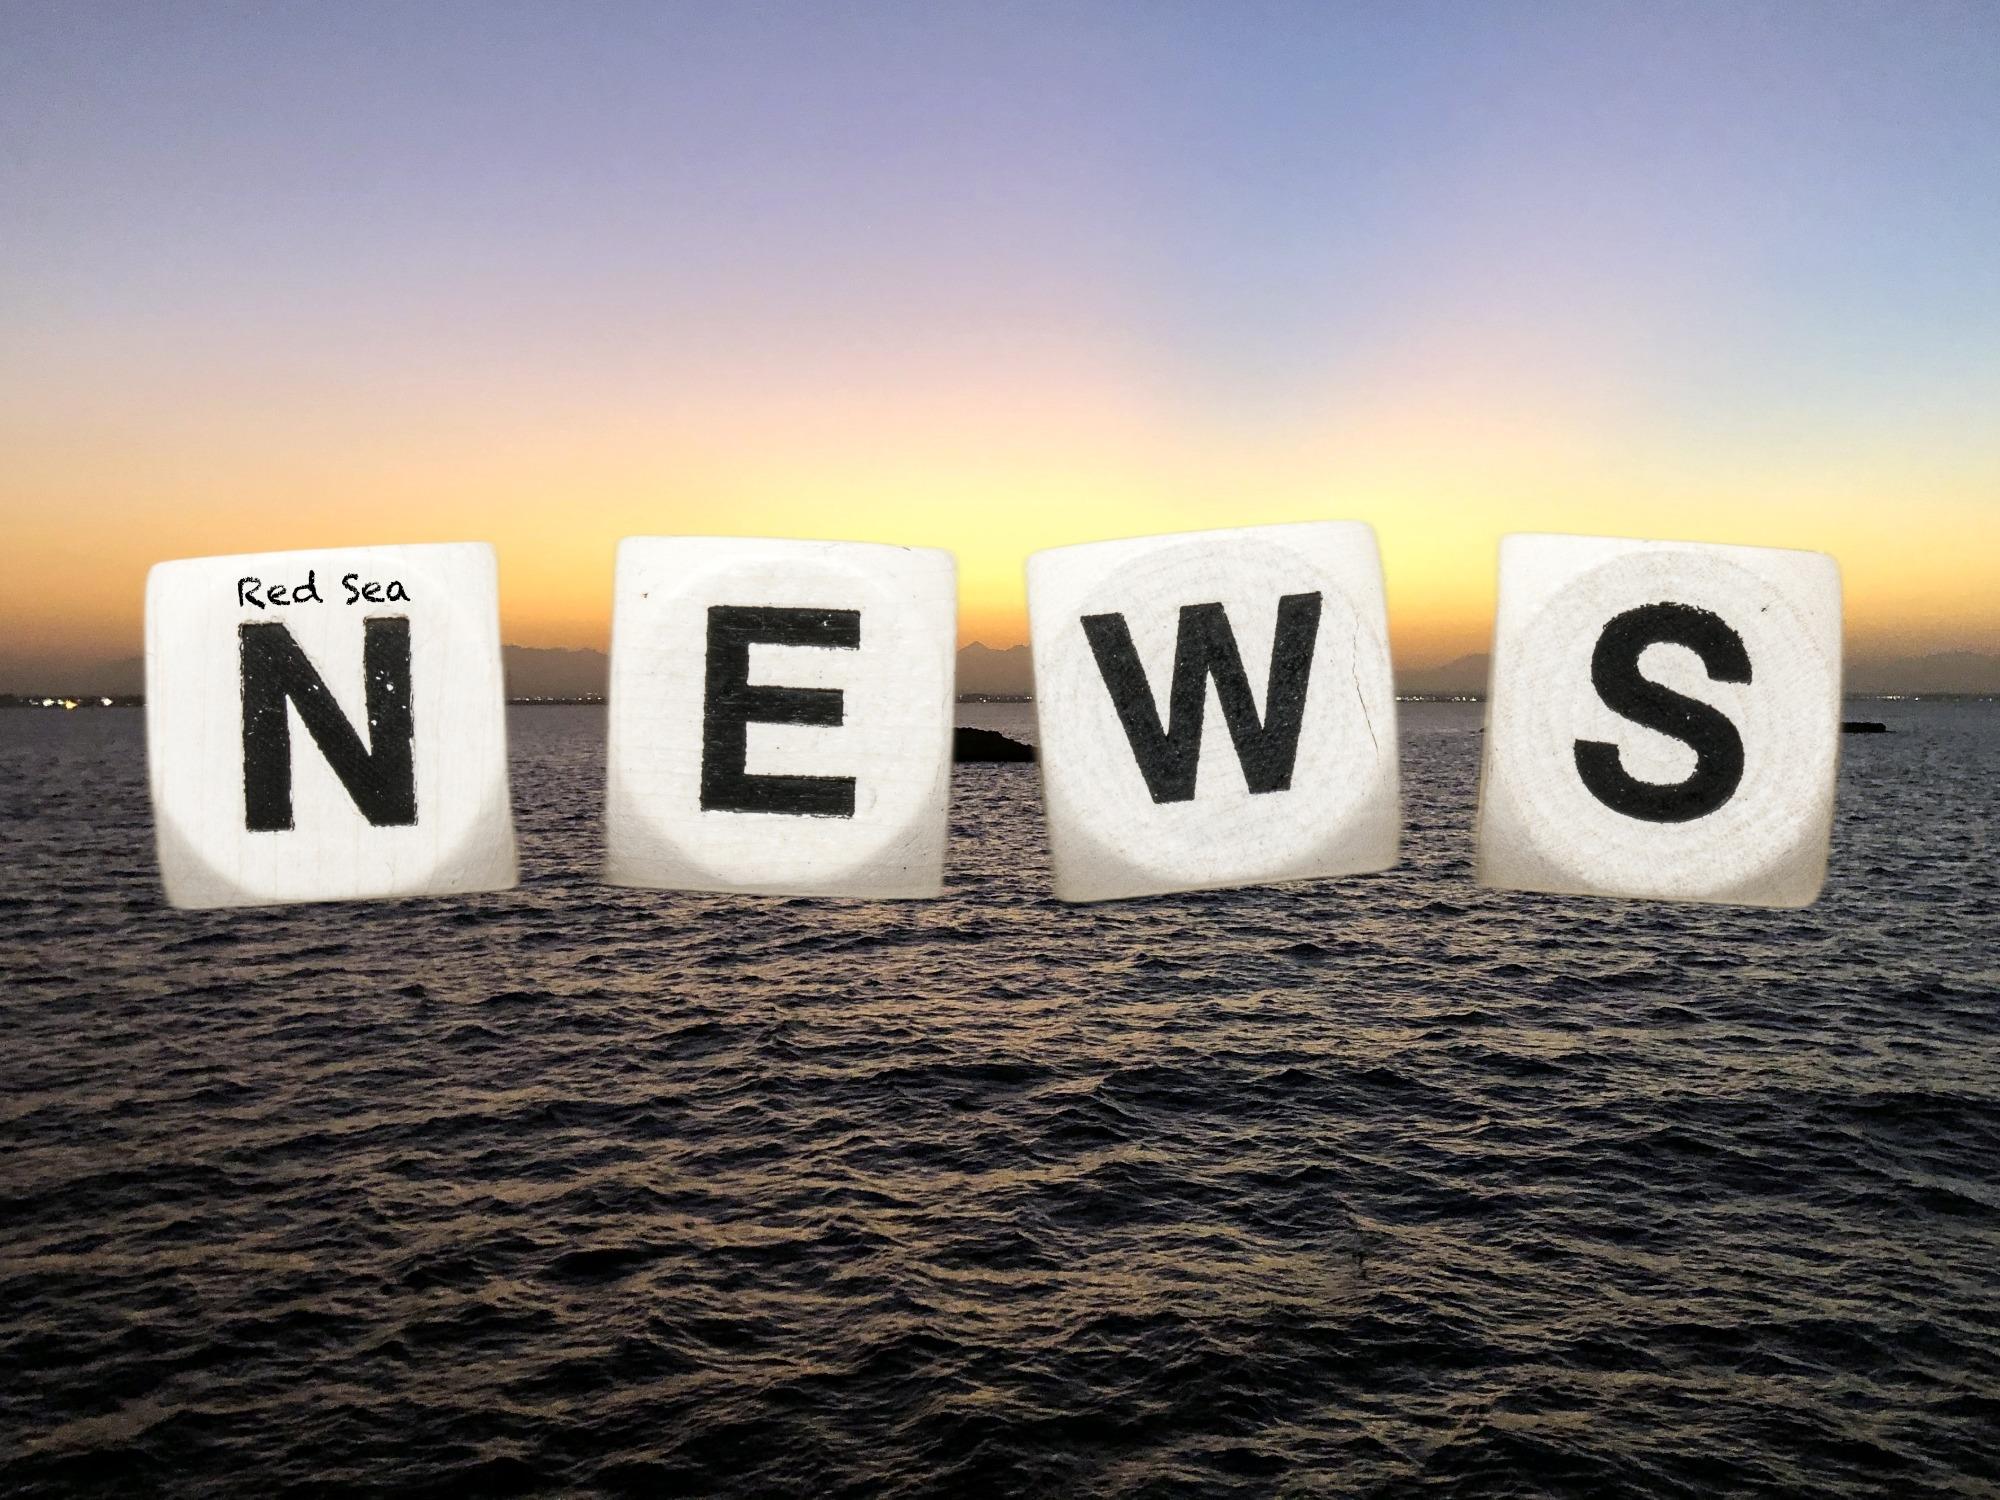 Red Sea News